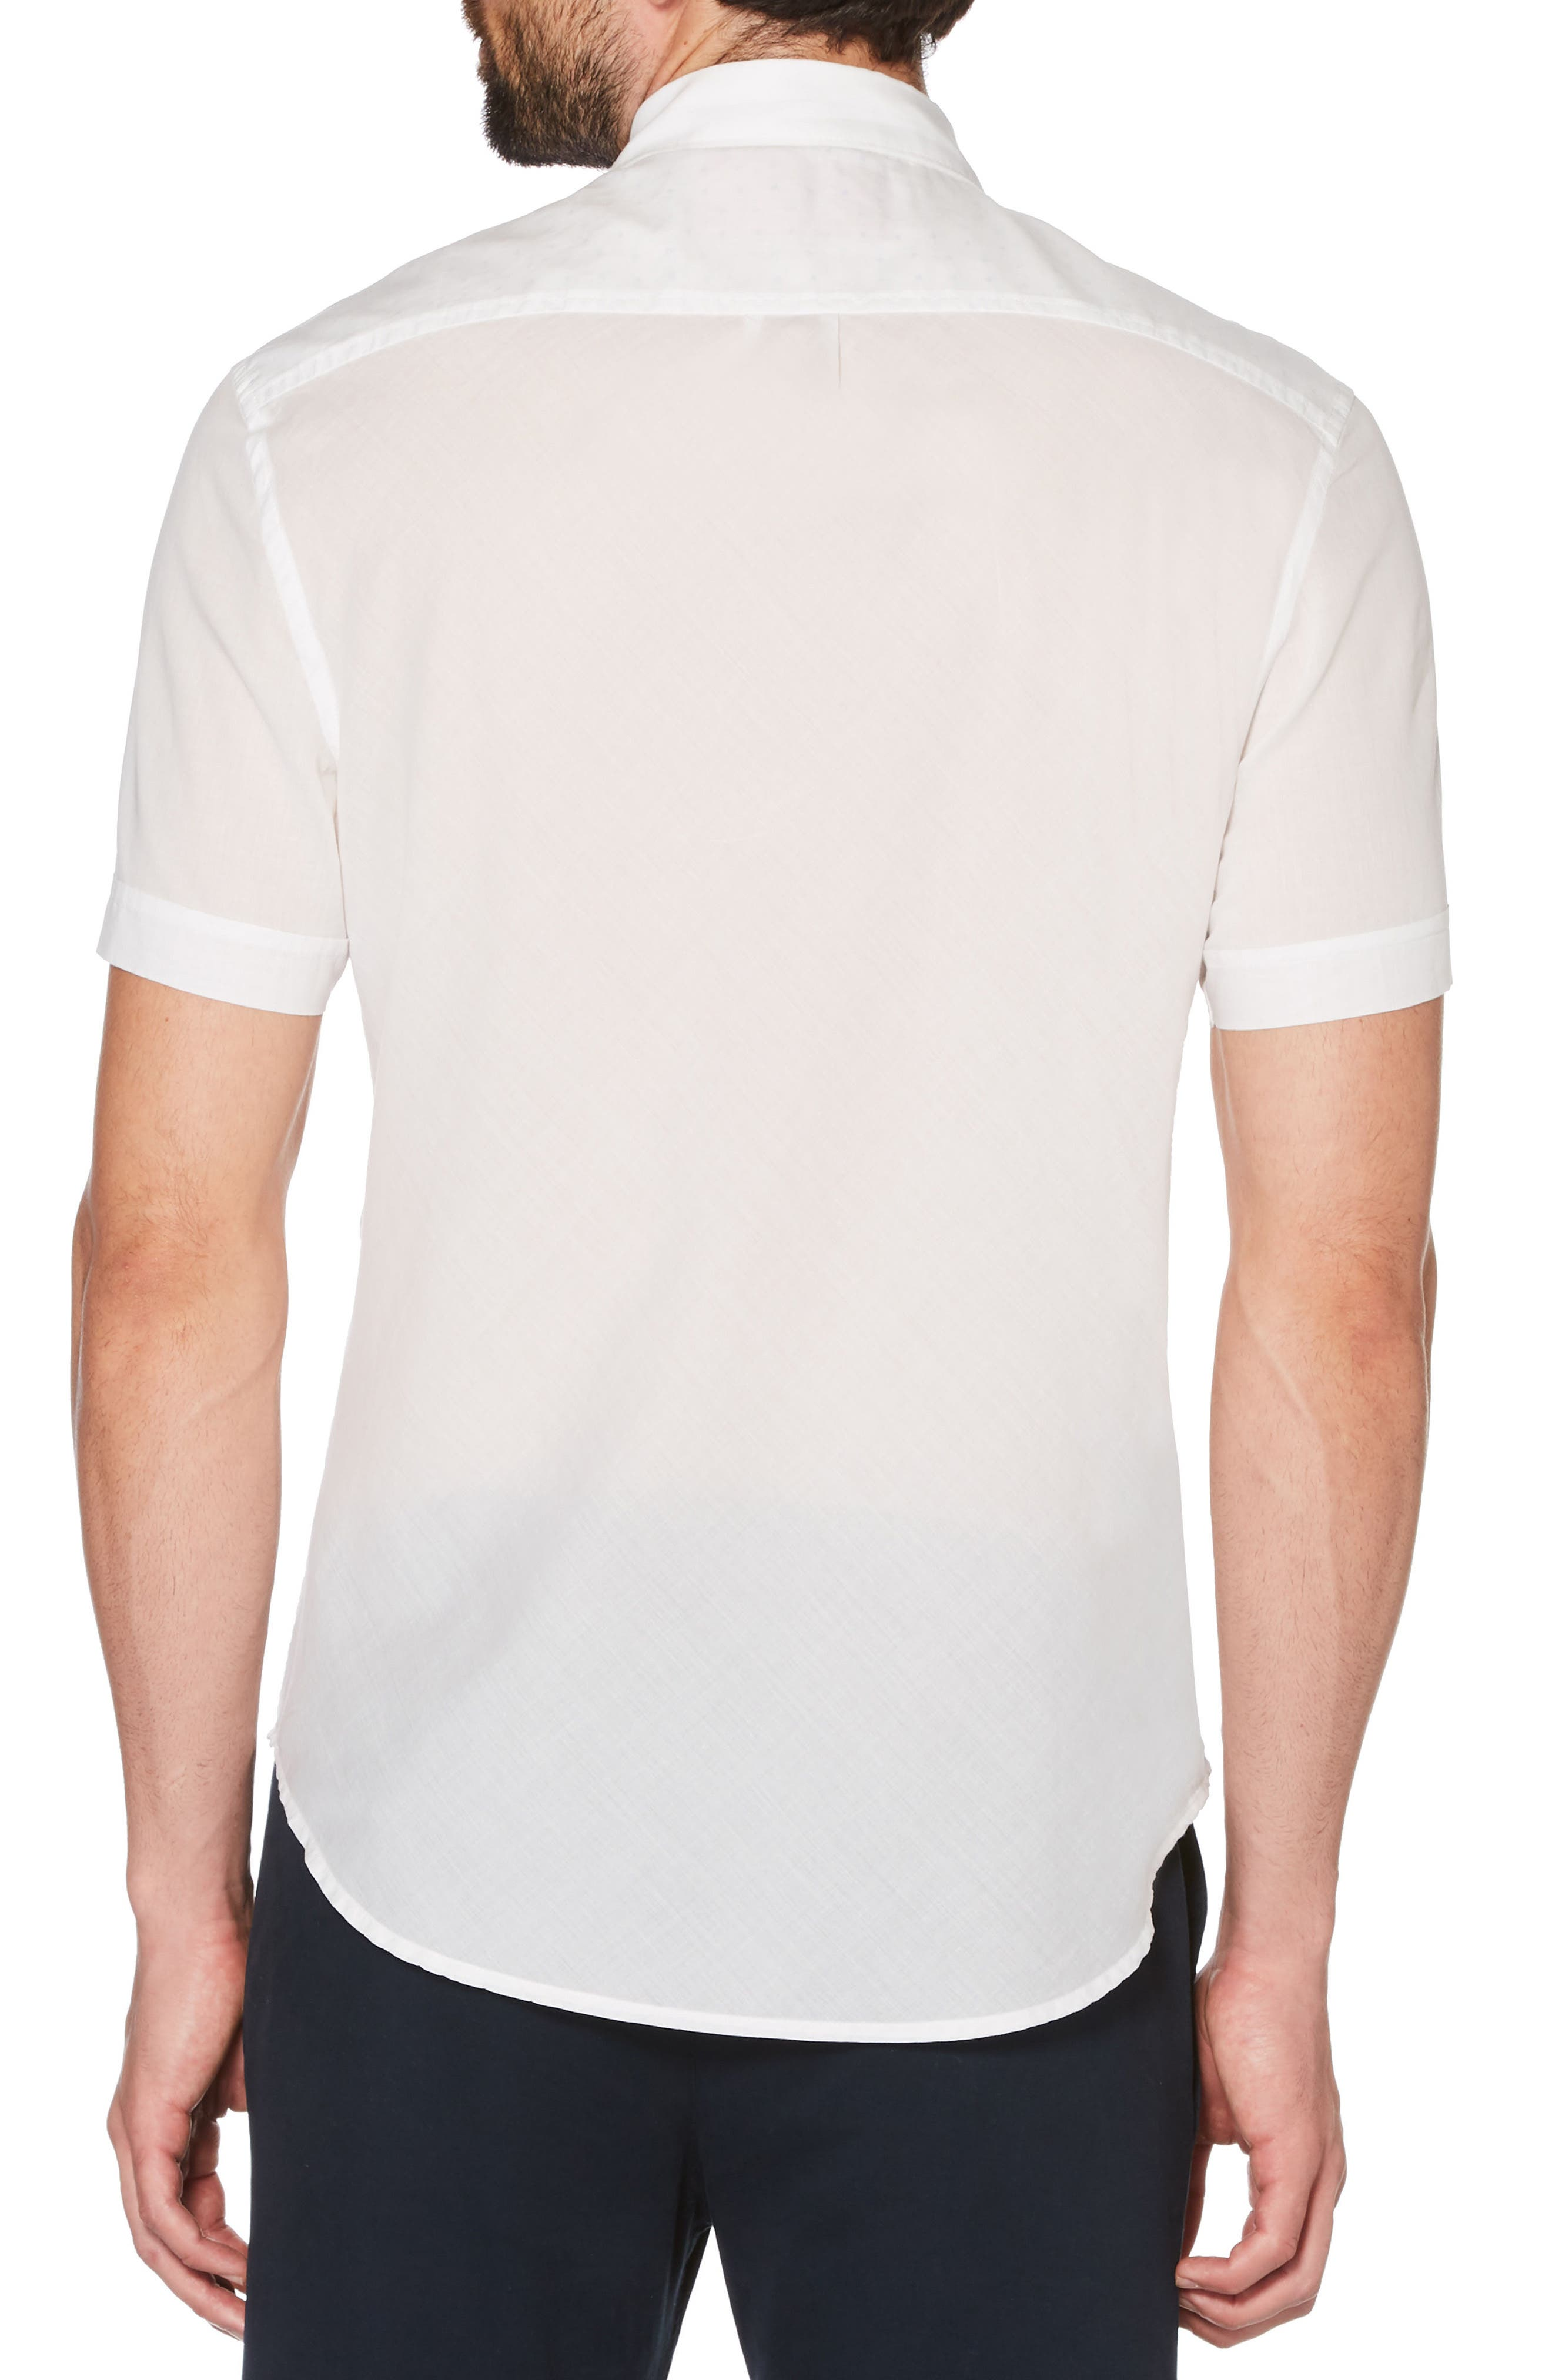 Engineered Stripe Shirt,                             Alternate thumbnail 2, color,                             118